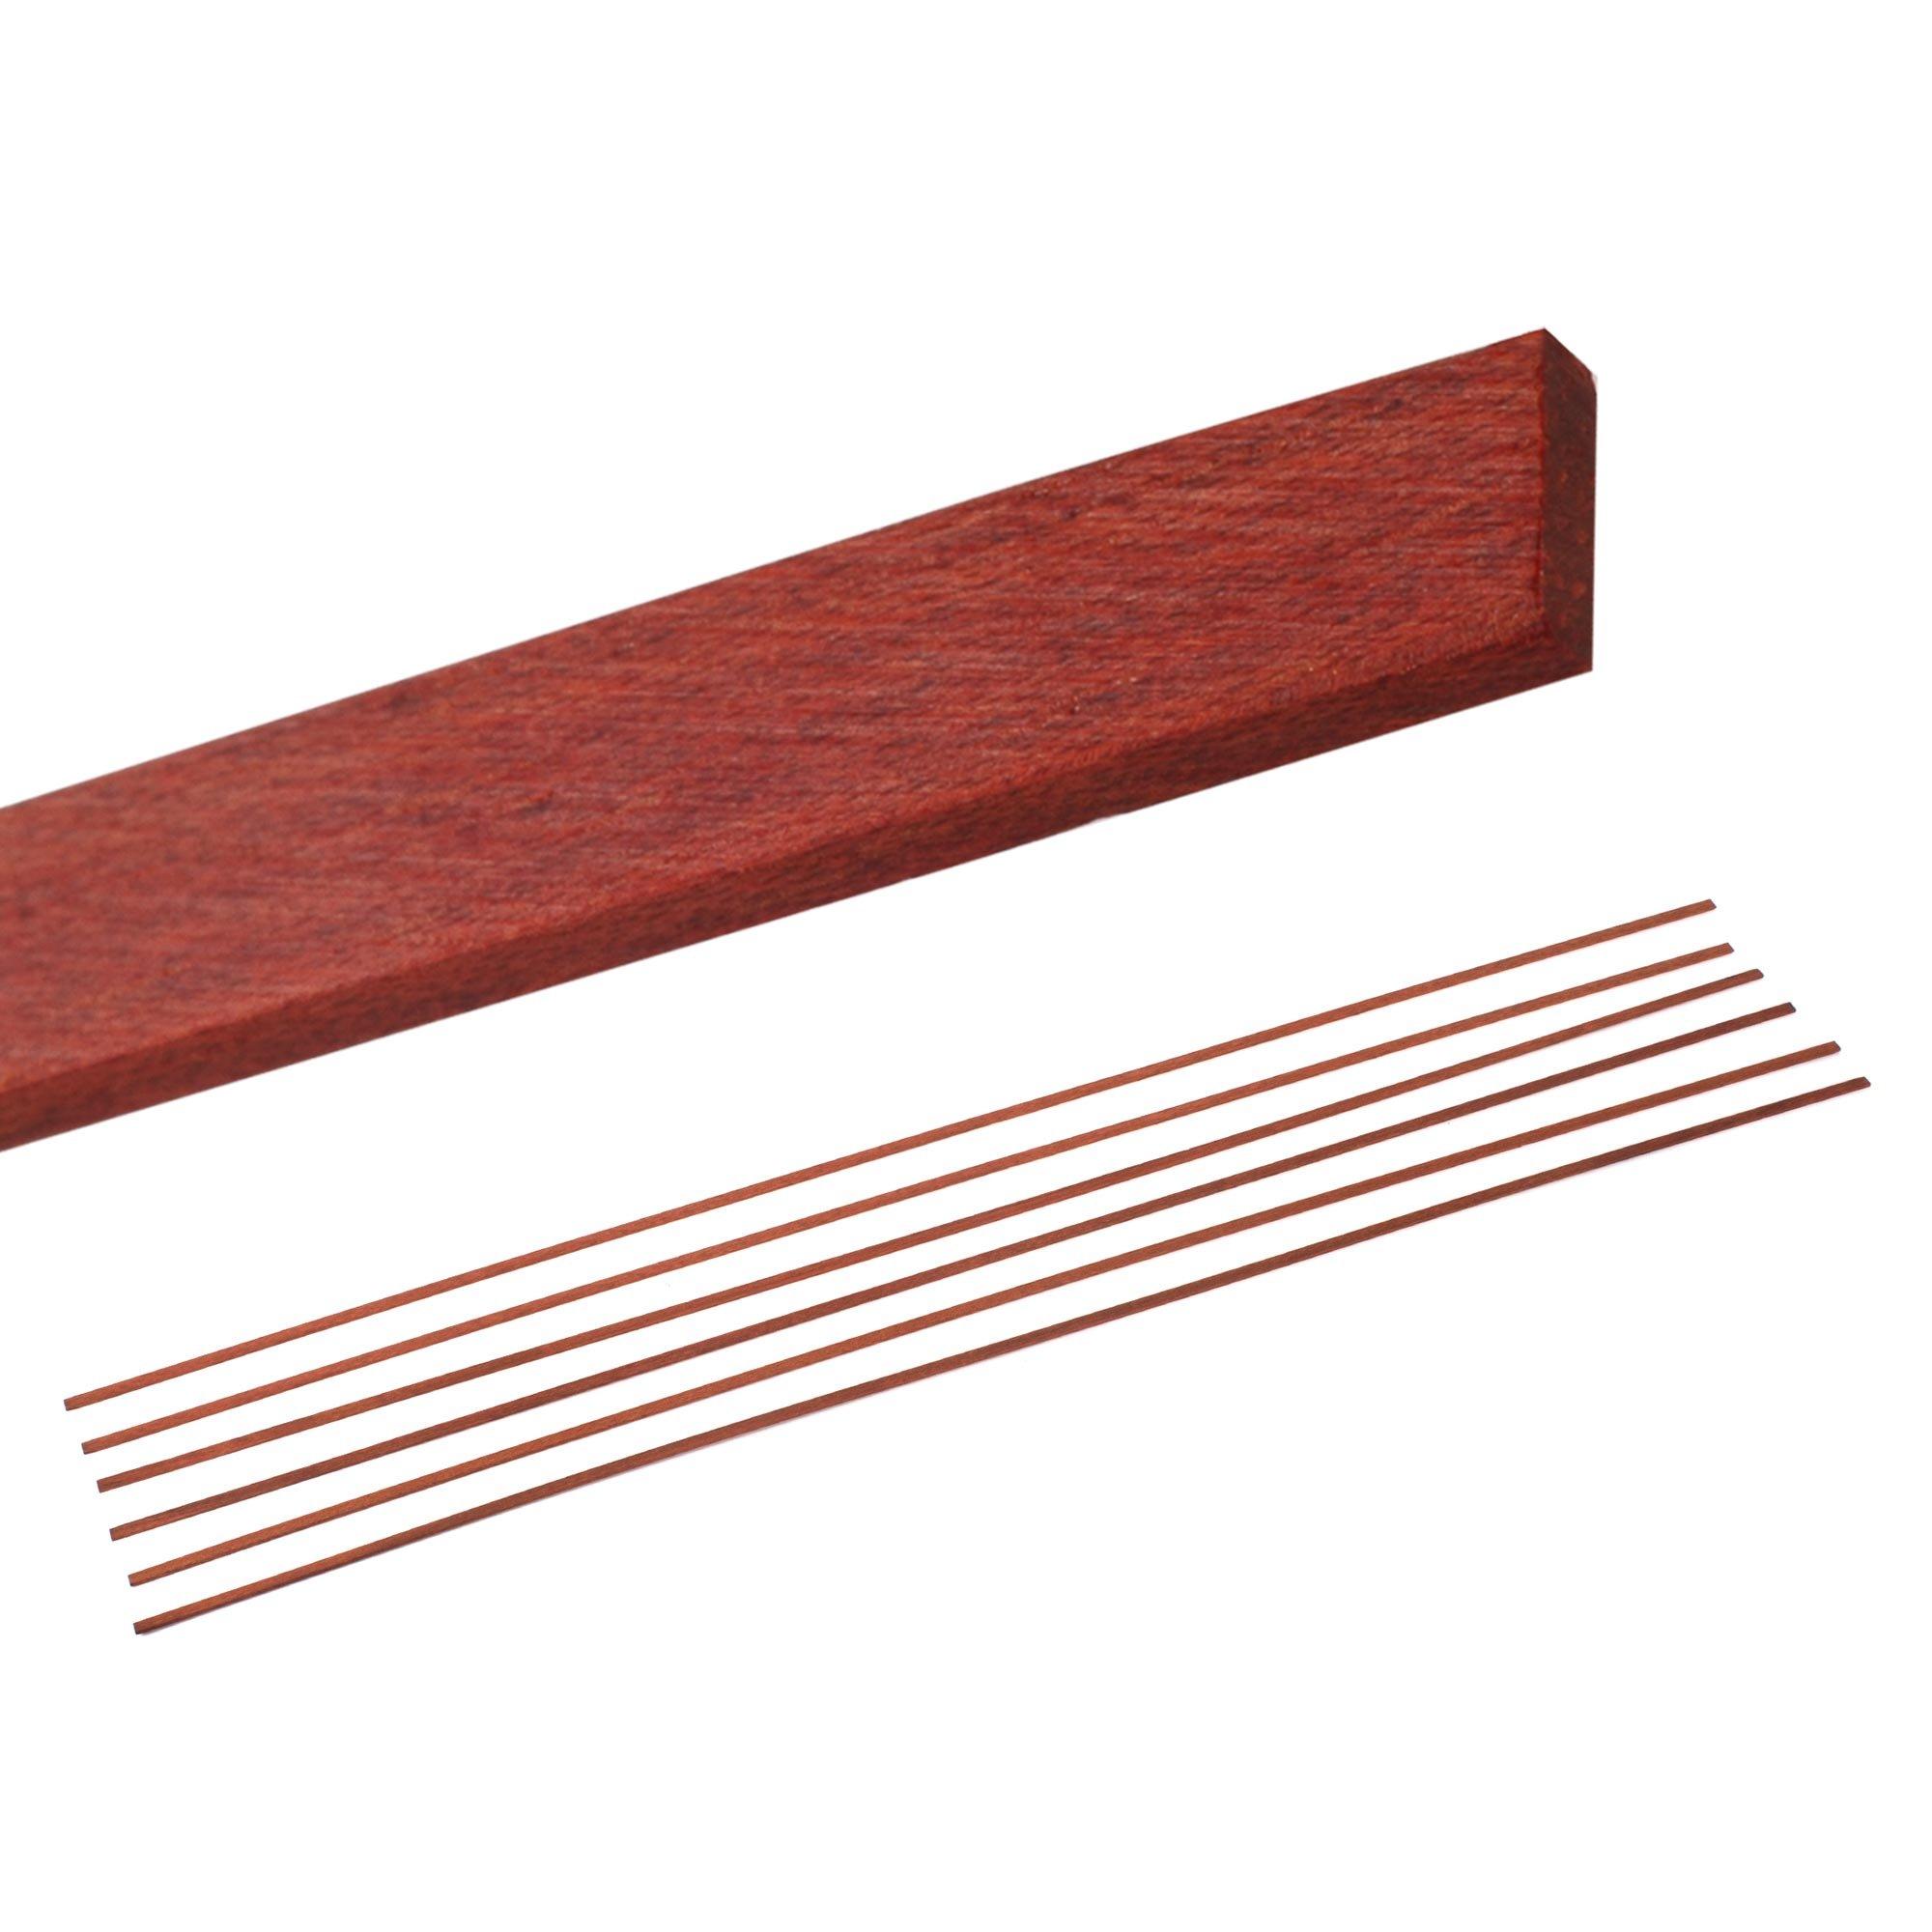 StewMac Natural Wood Guitar Bindings, Bloodwood - 6 Pack